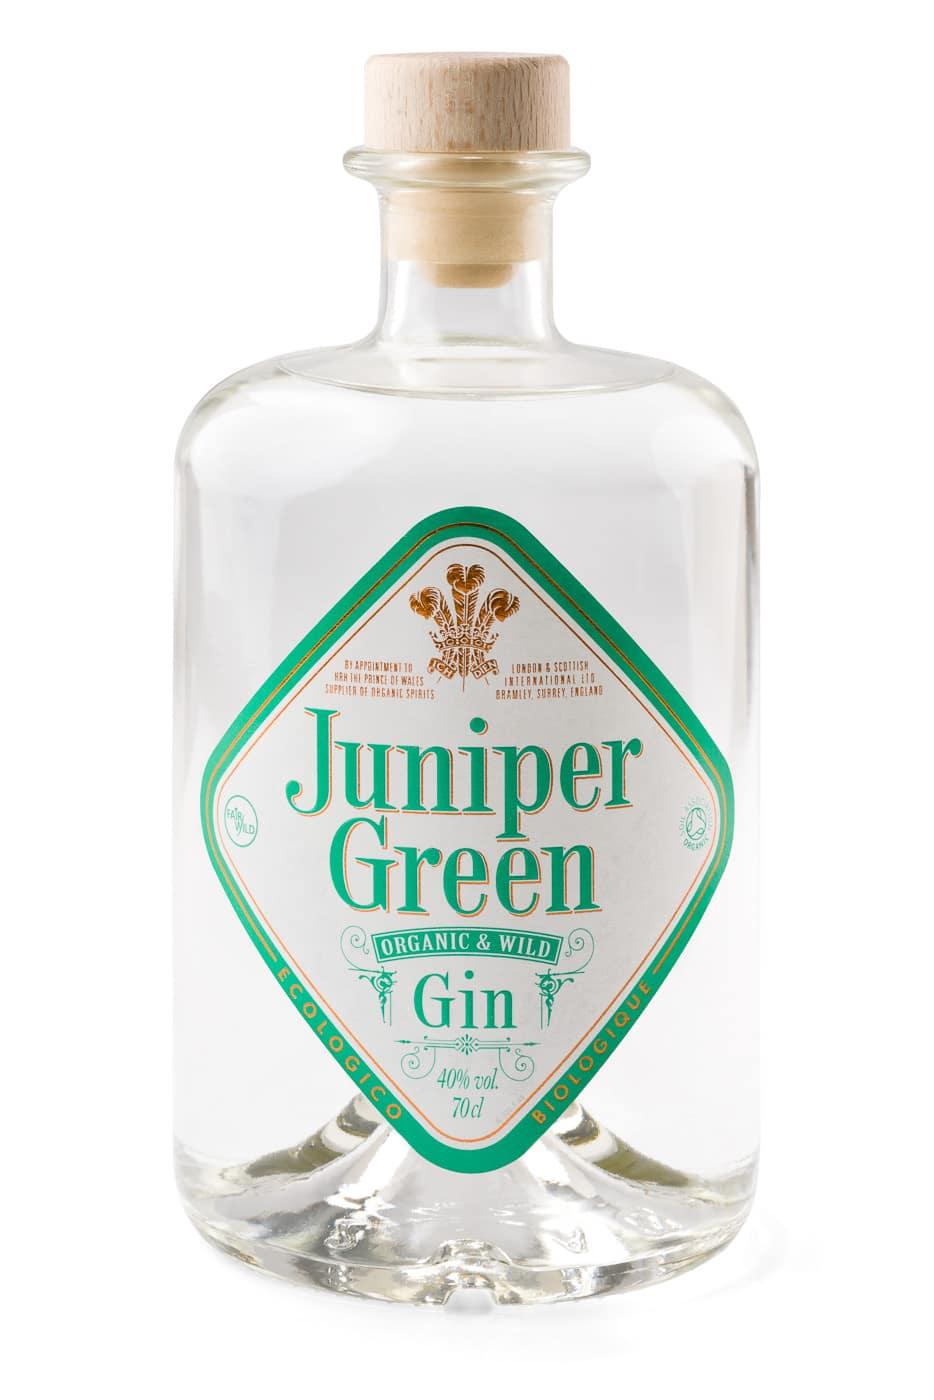 A very tasty gin